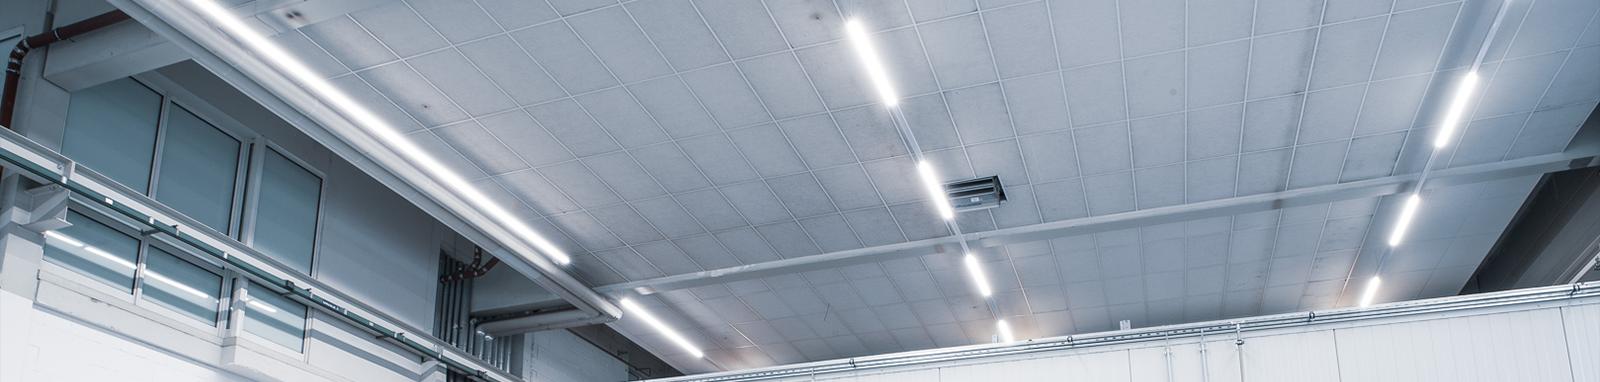 LX-Werkstatt-LED-Beleuchtung-1_Kopie